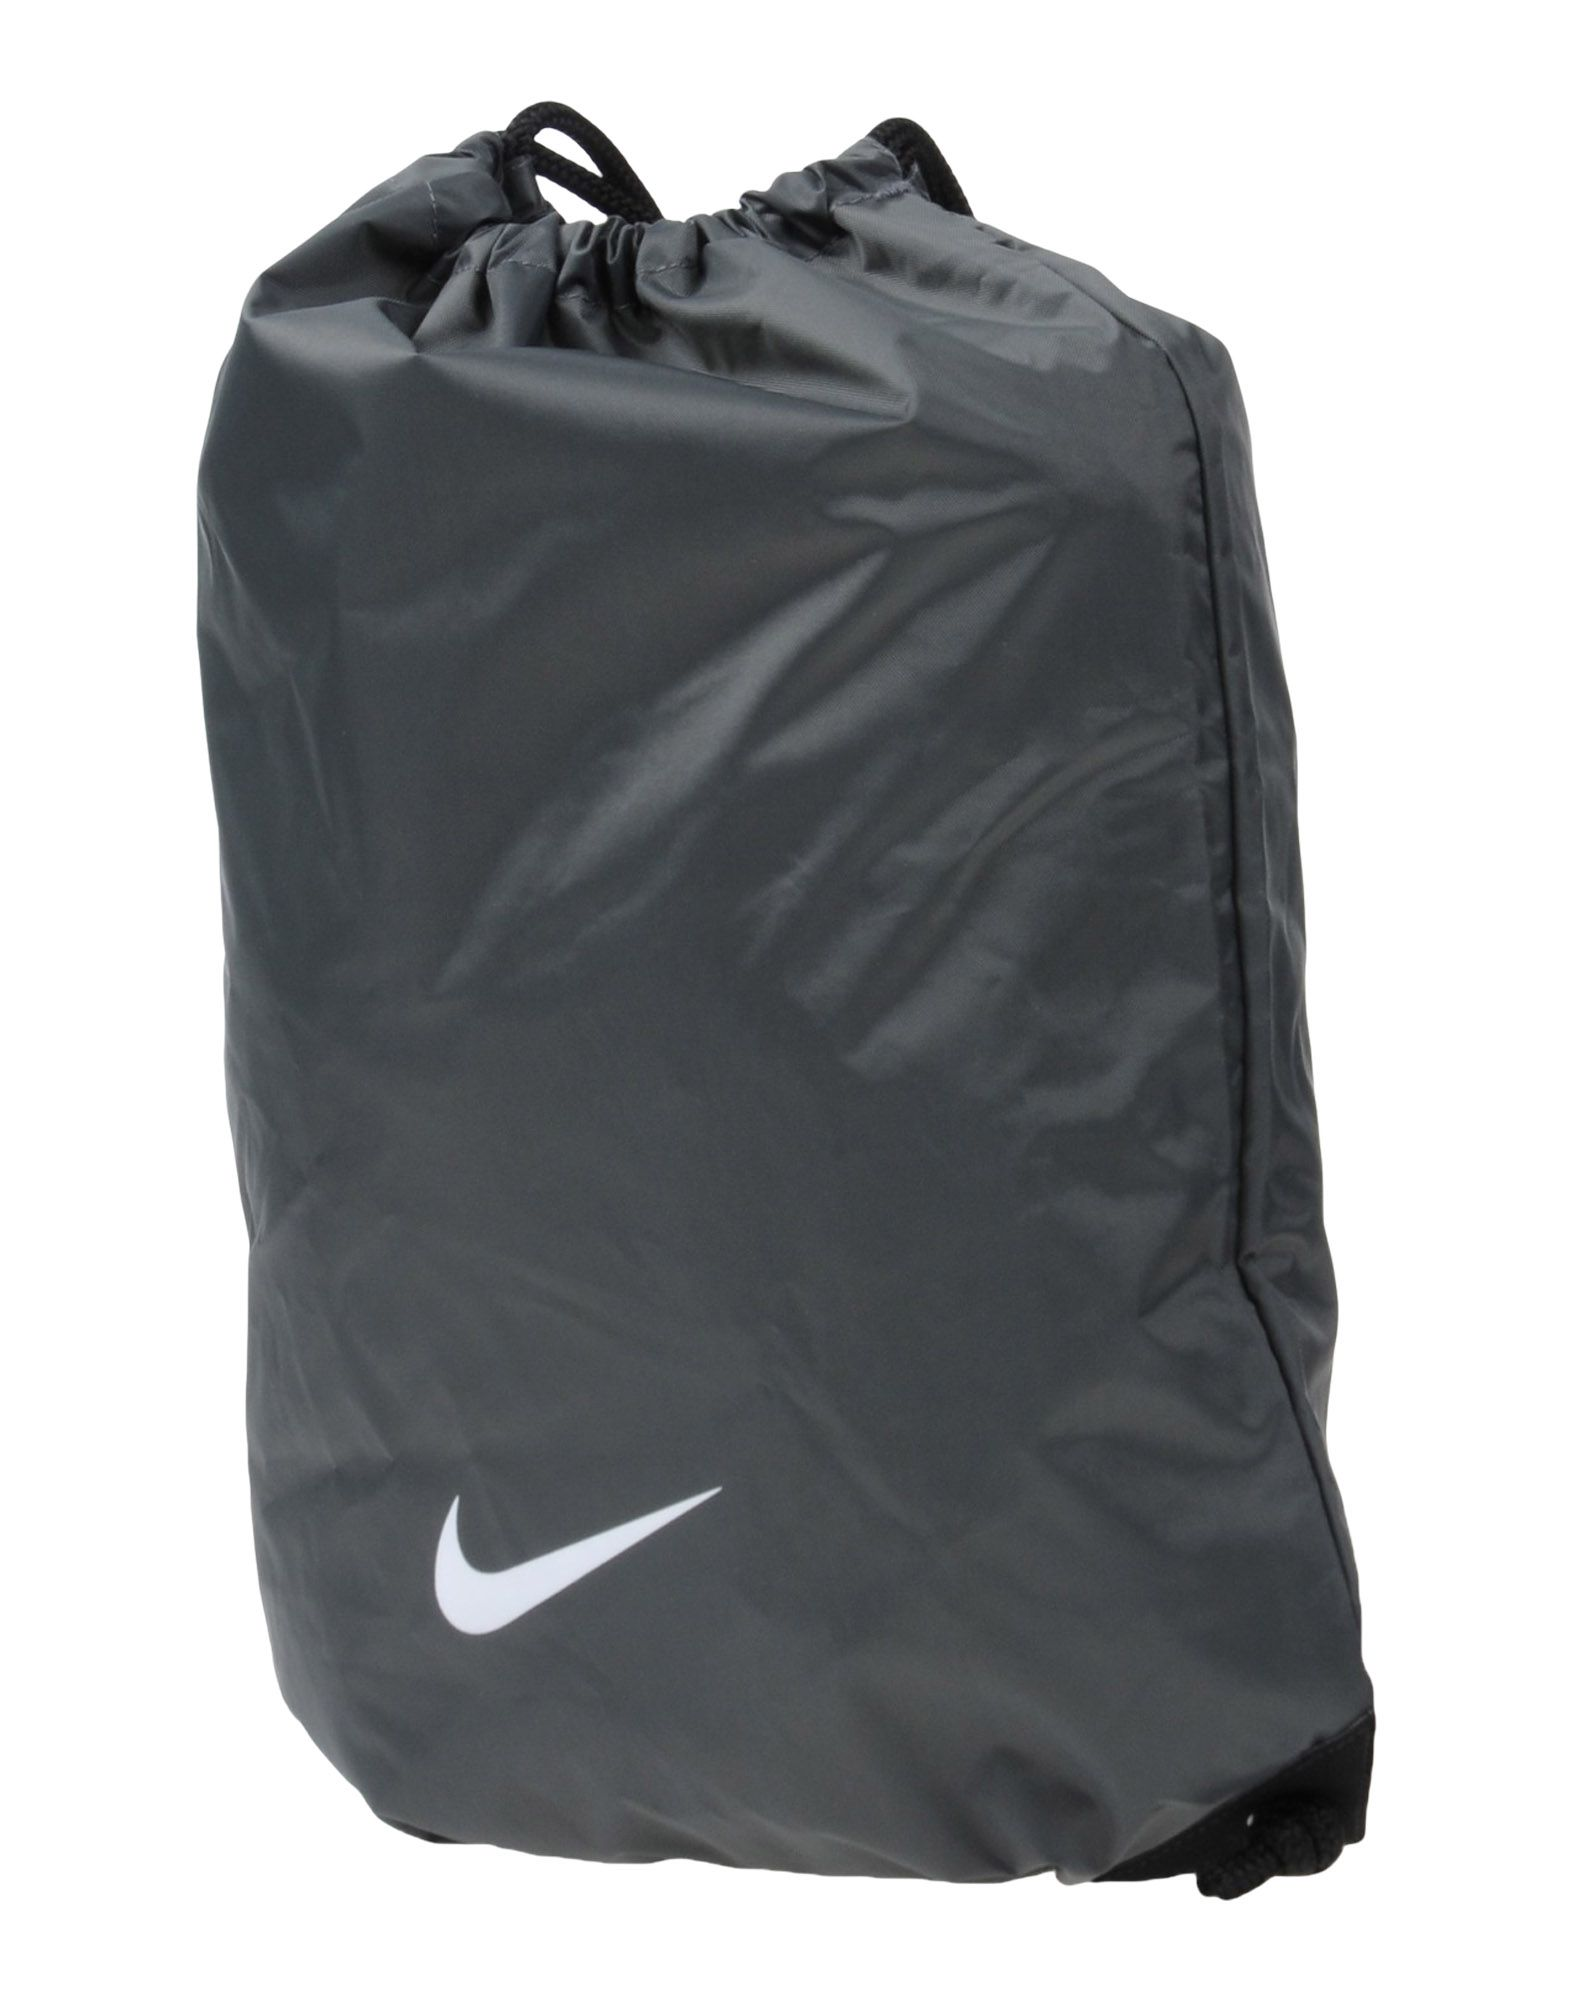 NIKE Рюкзаки и сумки на пояс сумки рюкзаки nike рюкзак детский nike brasilia backpack ba5473 657